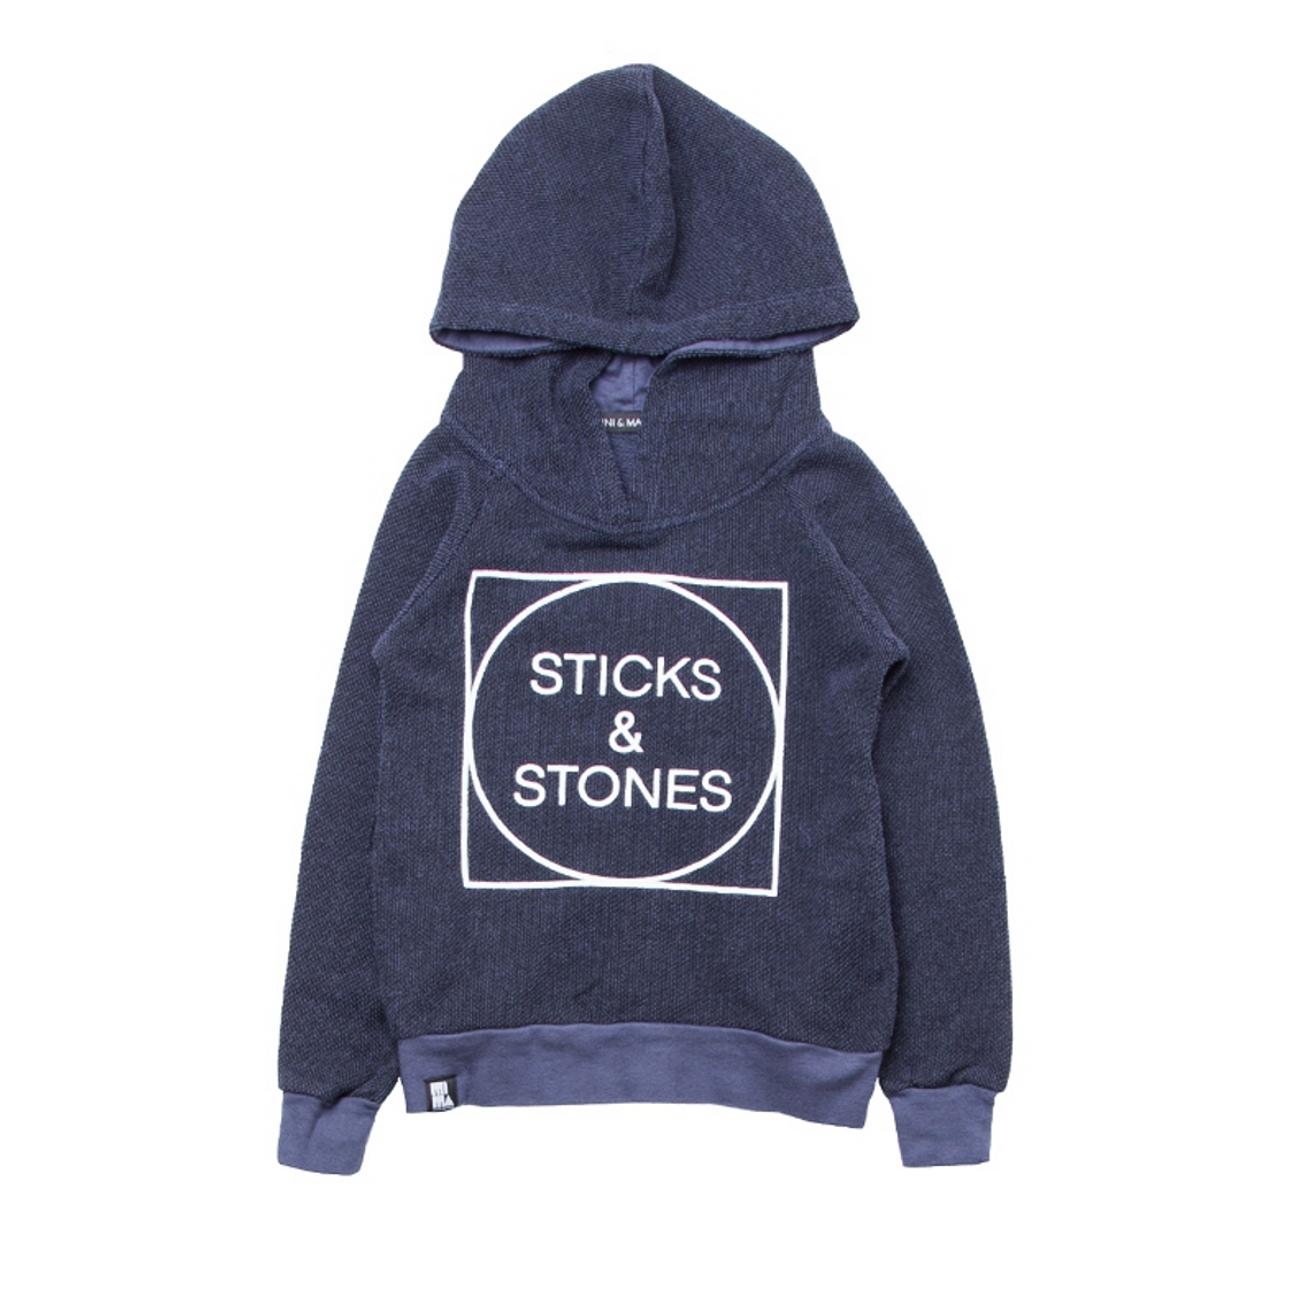 sticks ZIRIMOLA amp; capucha stones MINI shop eco sudadera and MAXIMUS con qXwqd8g